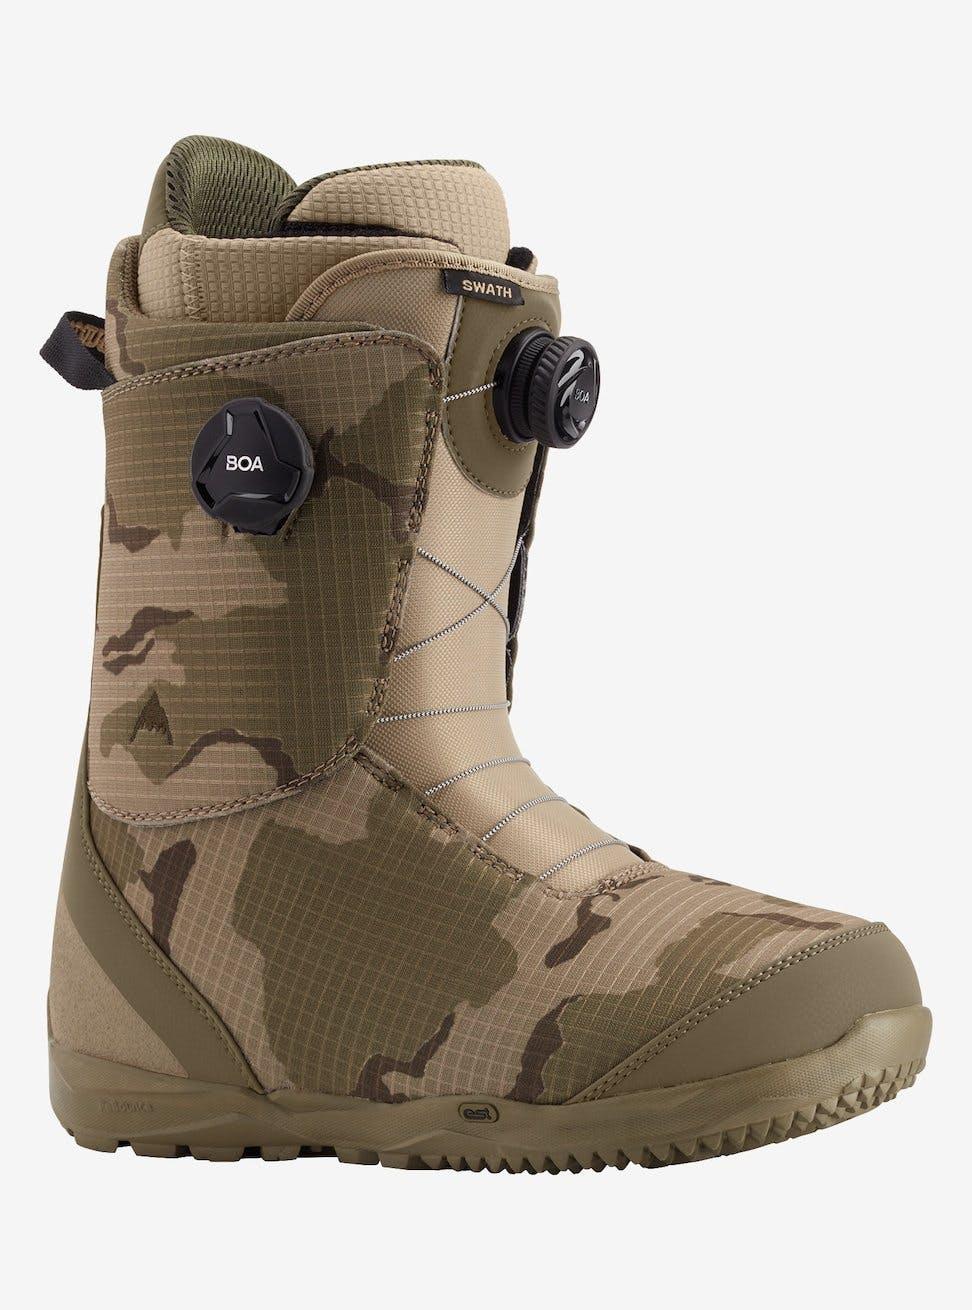 Burton Swath BOA Snowboard Boots · 2021